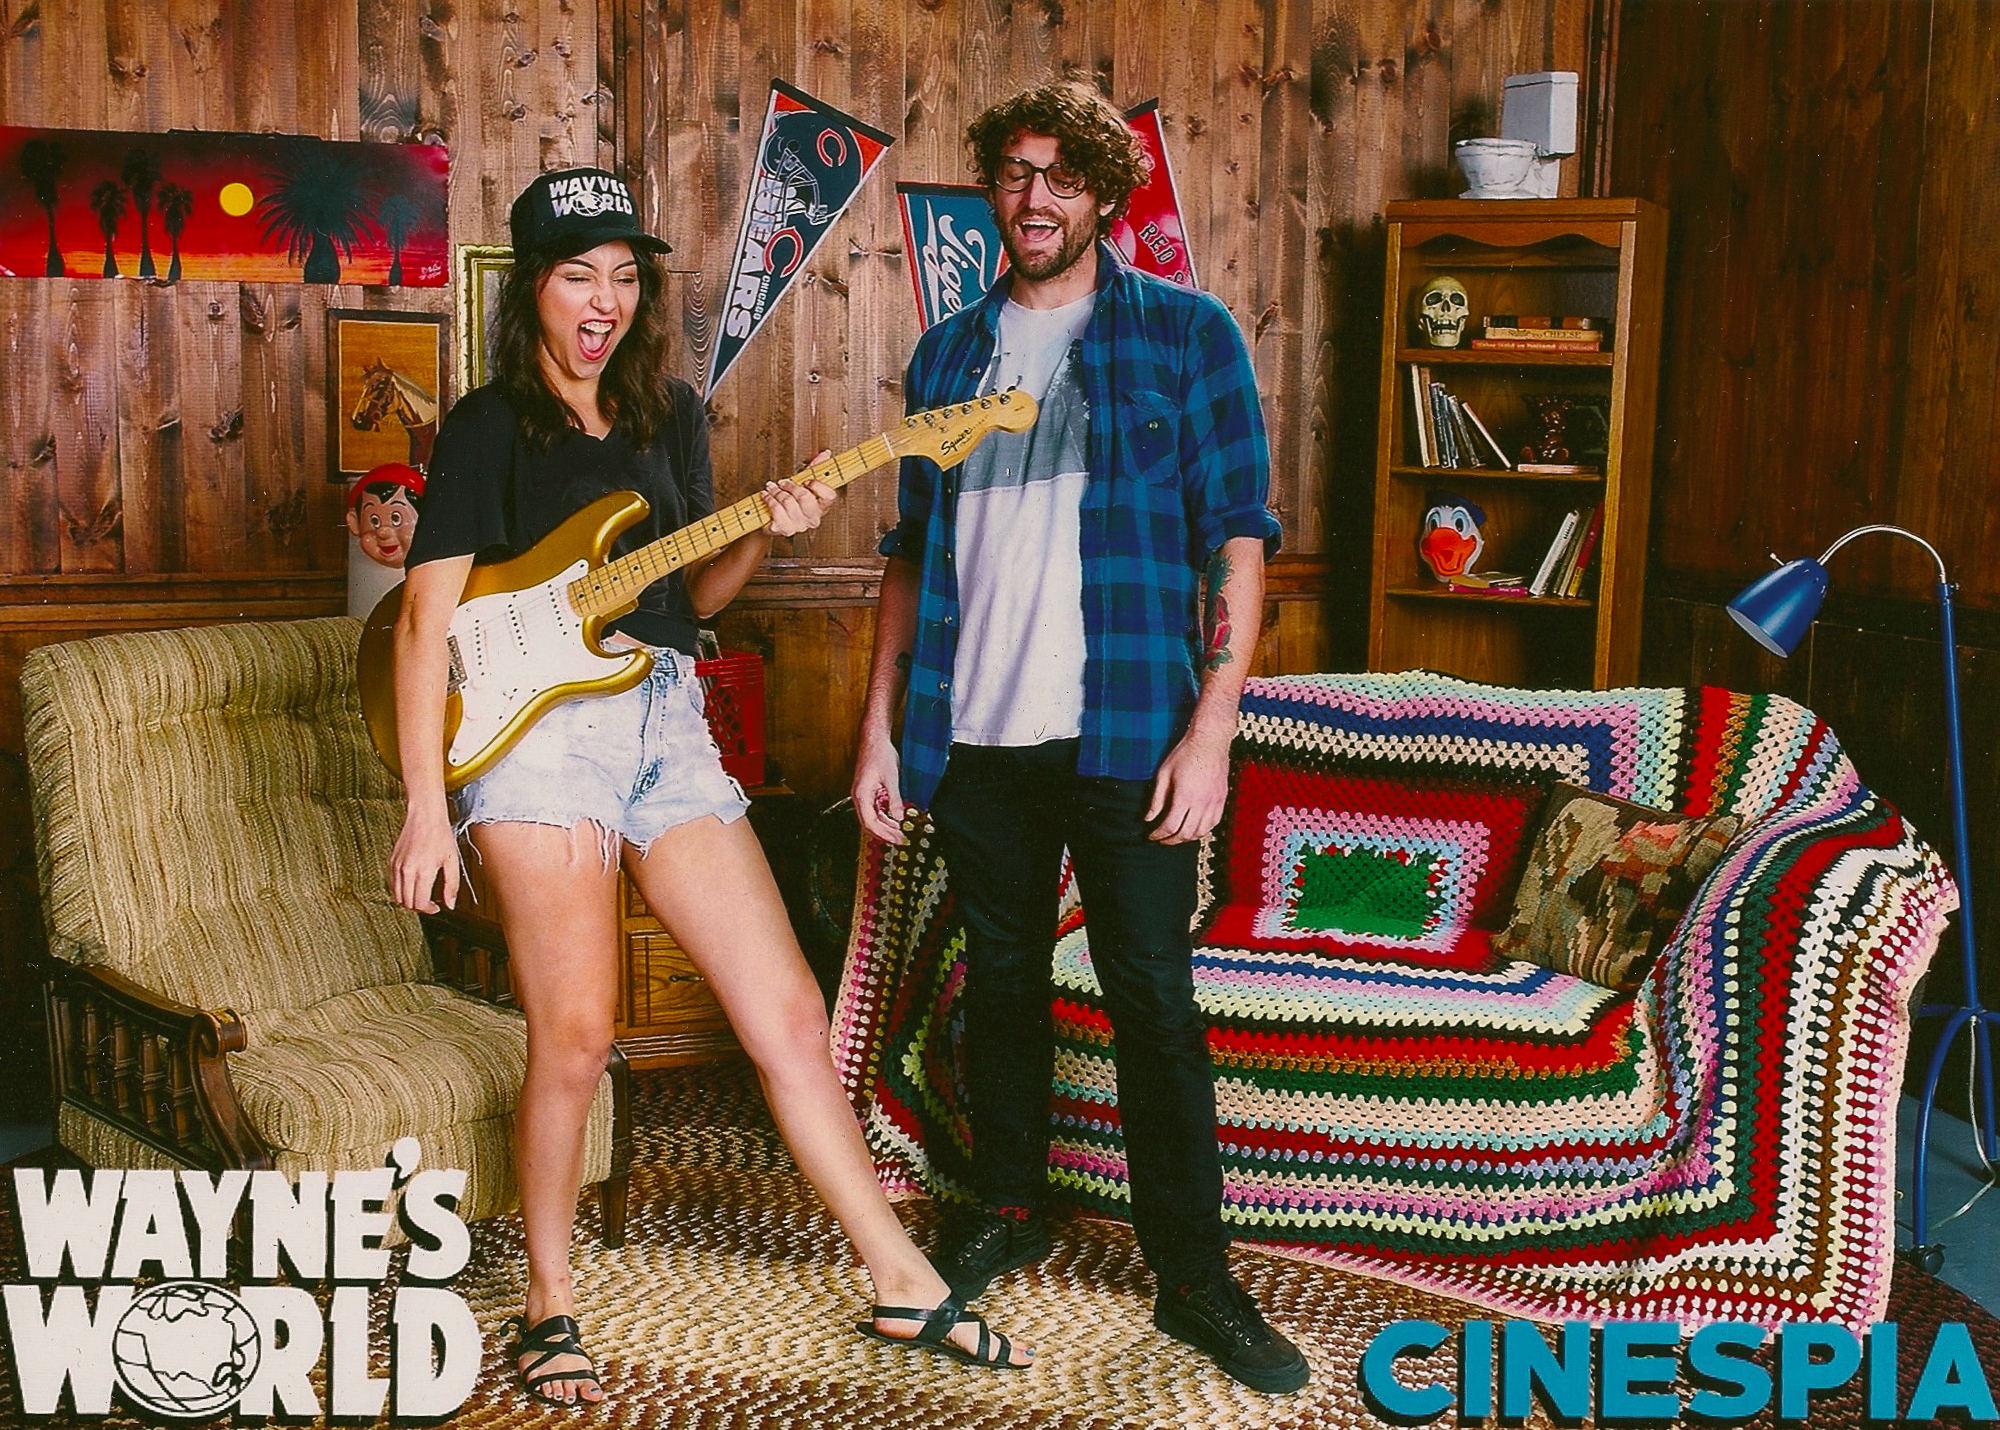 Cinespia Wayne's World